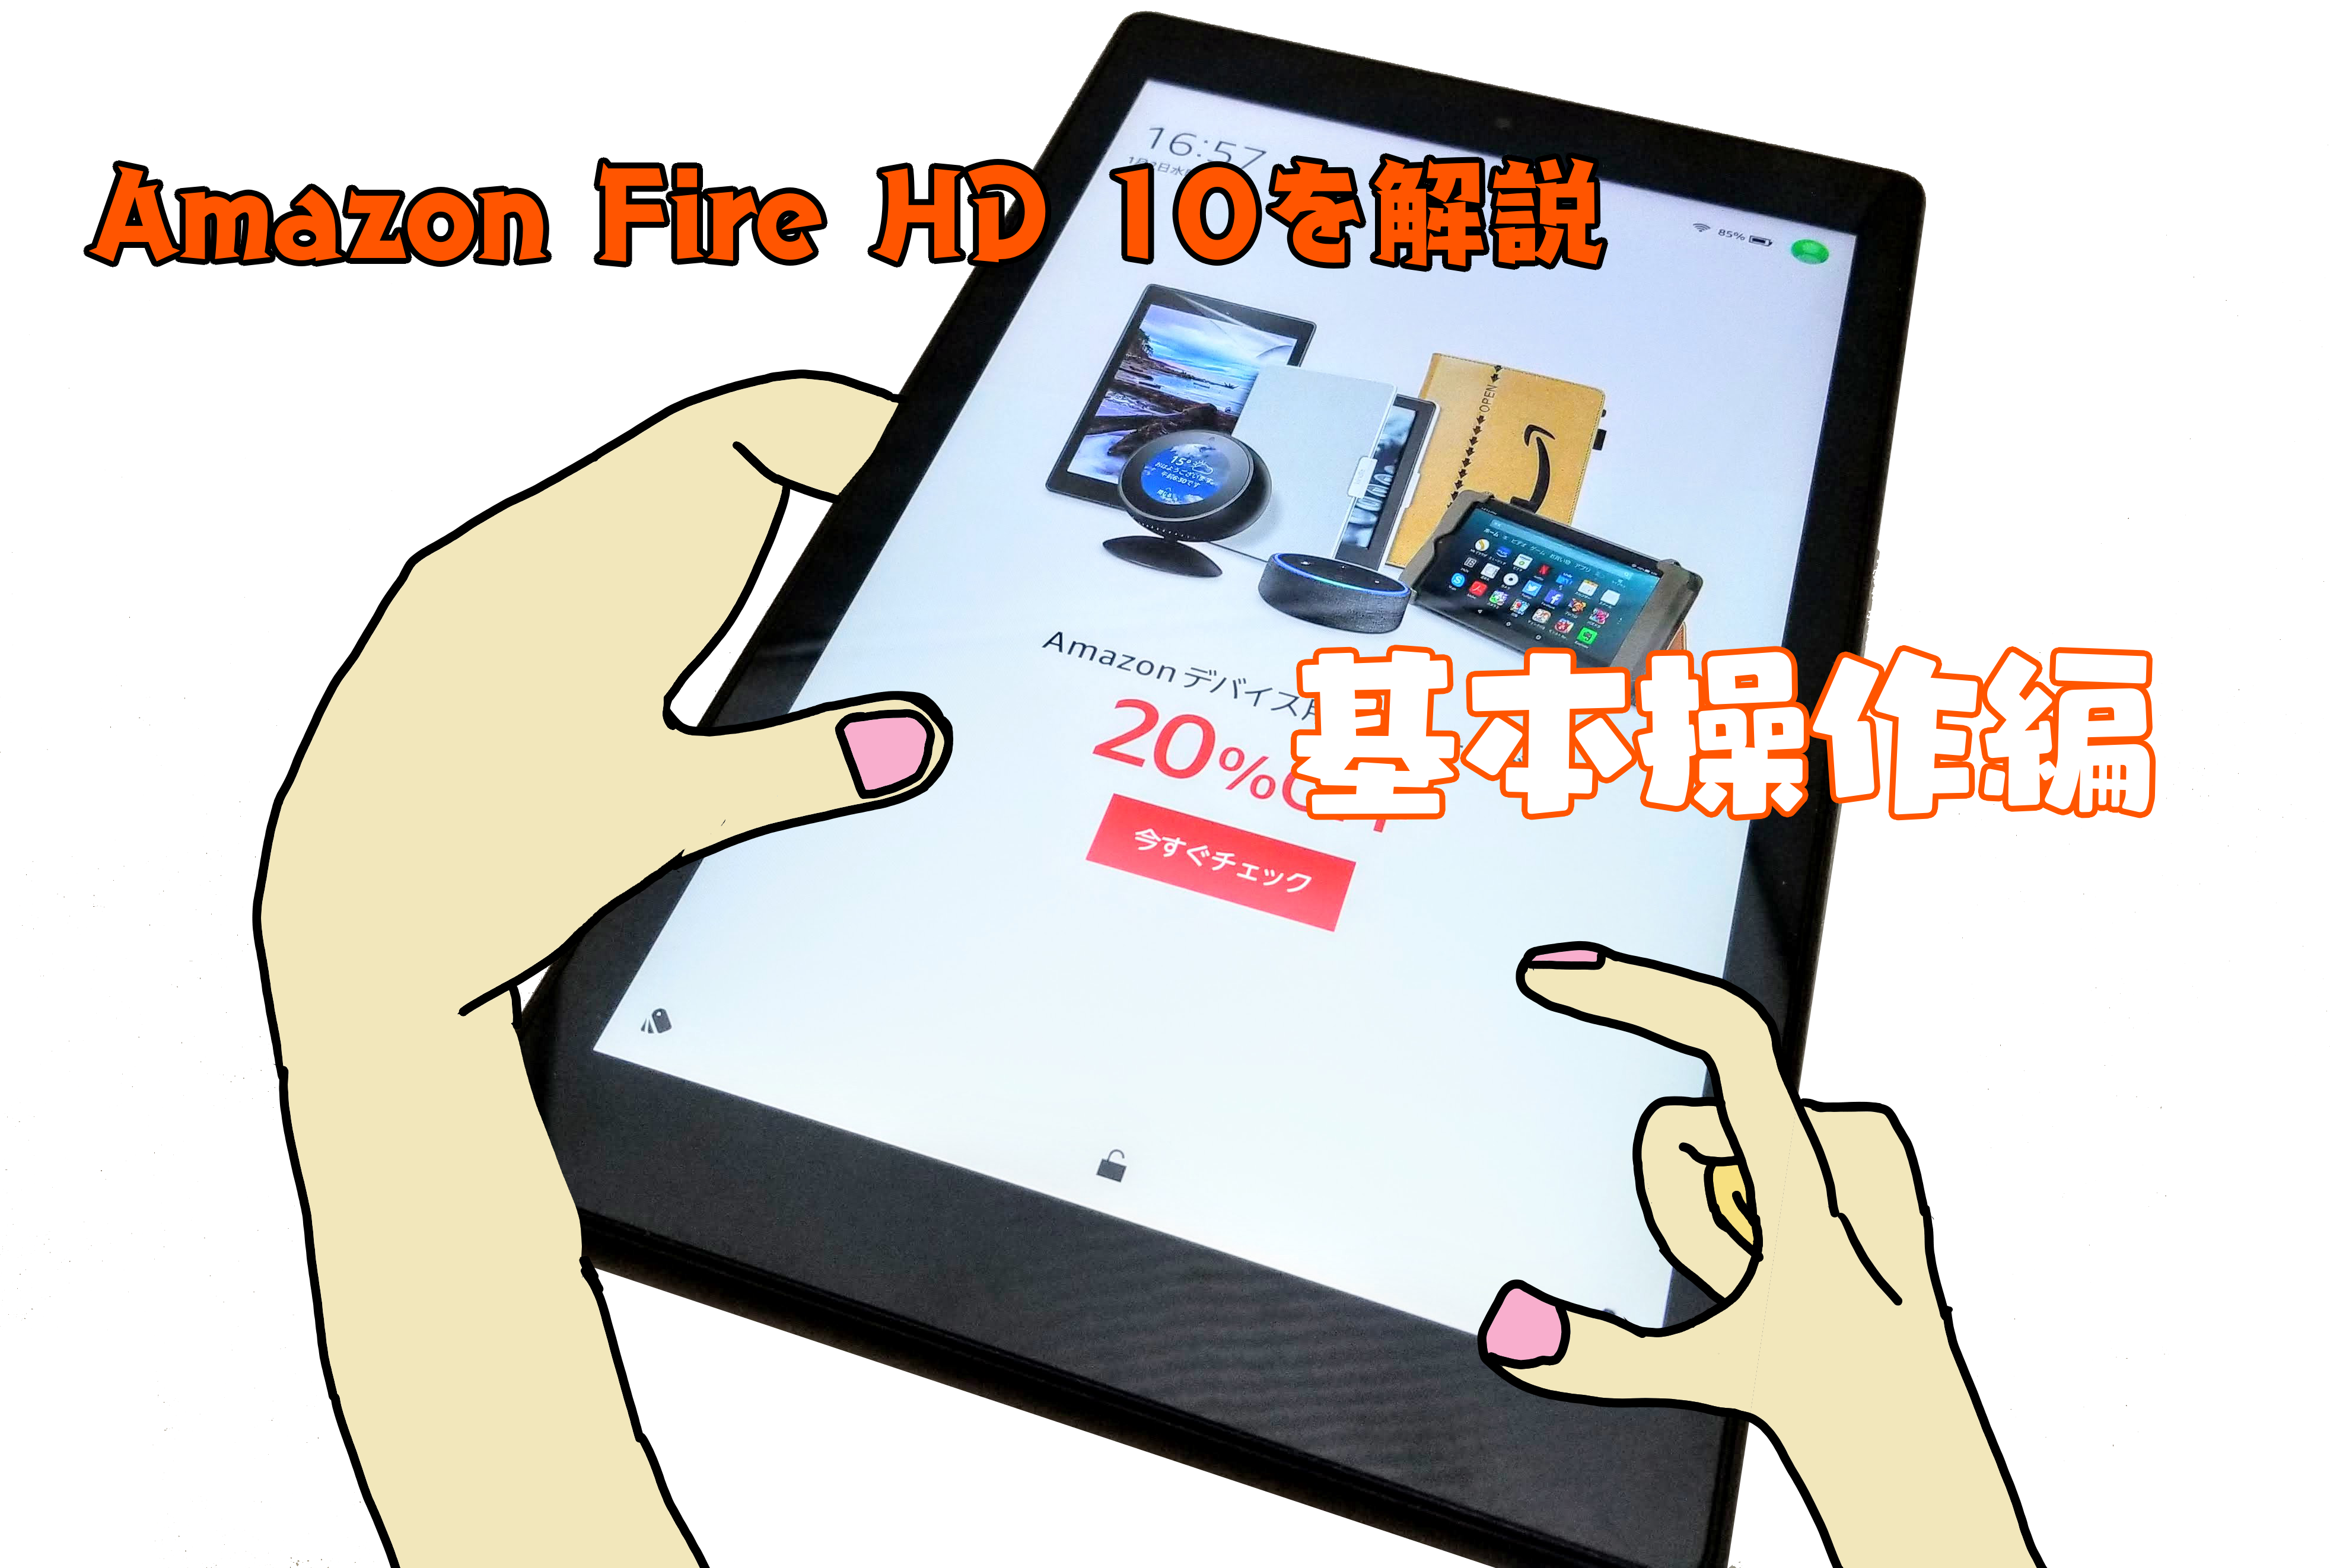 Fire HD 10 基本操作編アイキャッチ画像